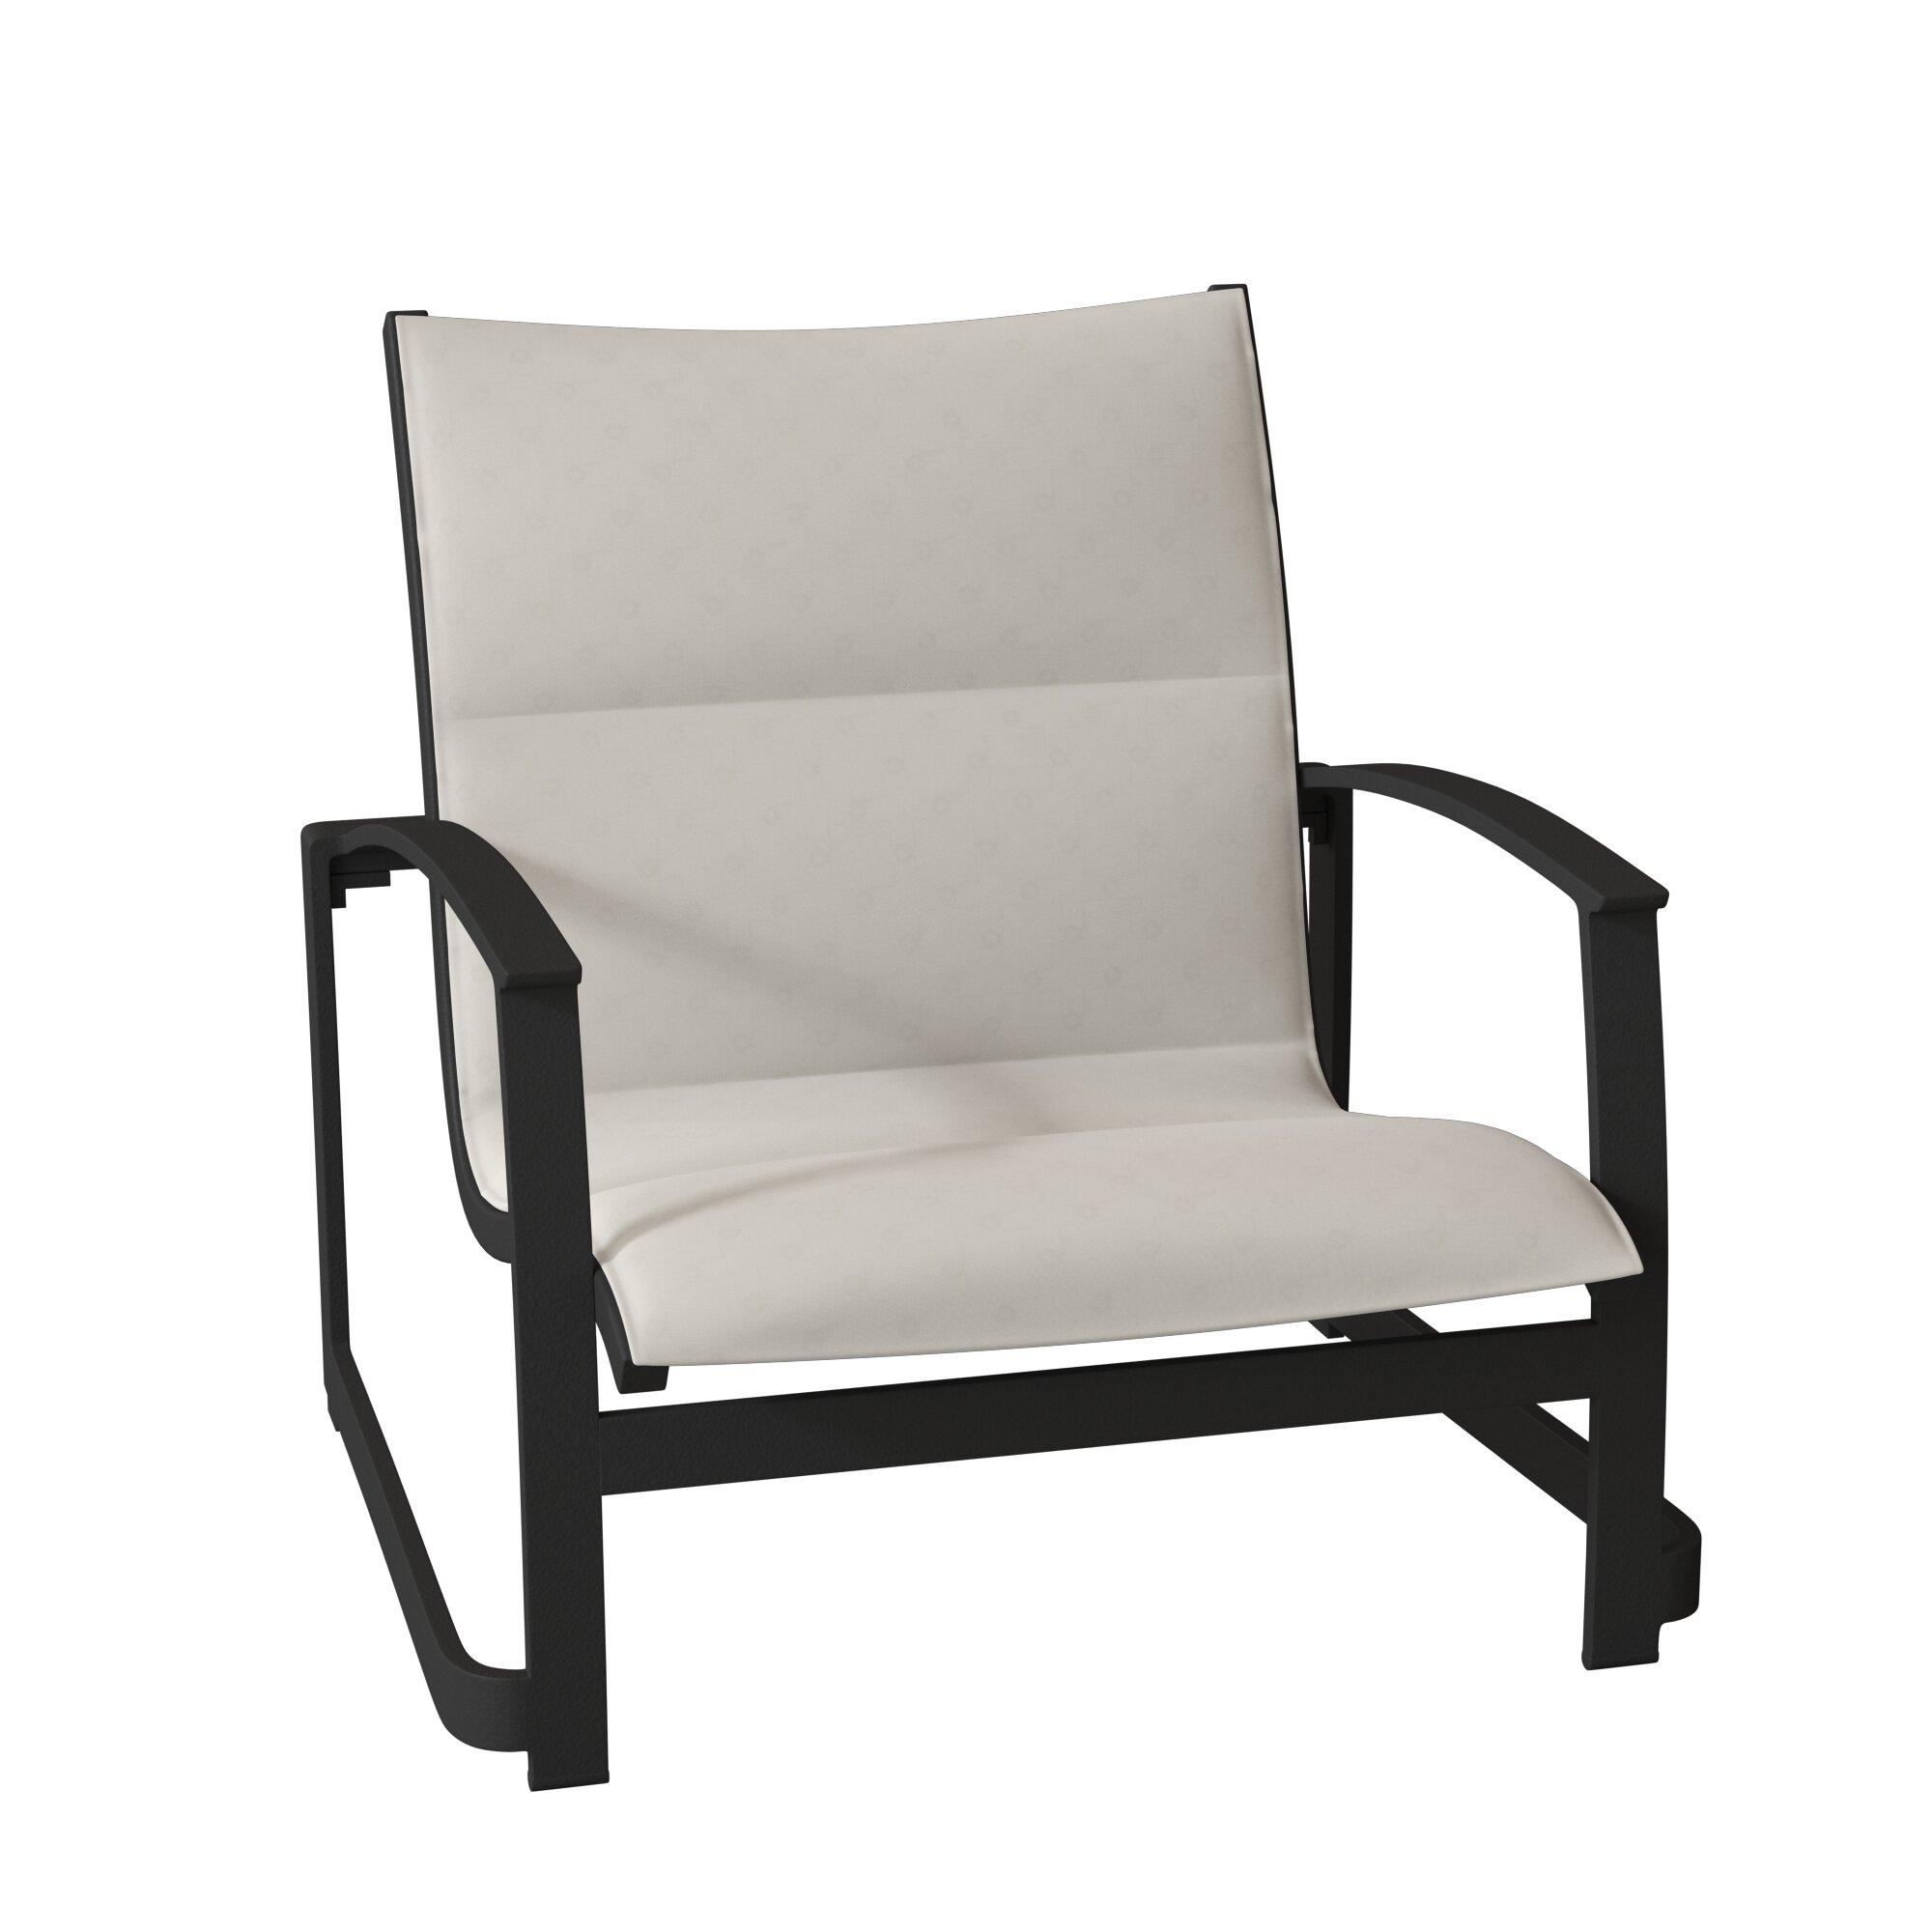 Tropitone Mainsail Padded Sling Sand Patio Chair Wayfair